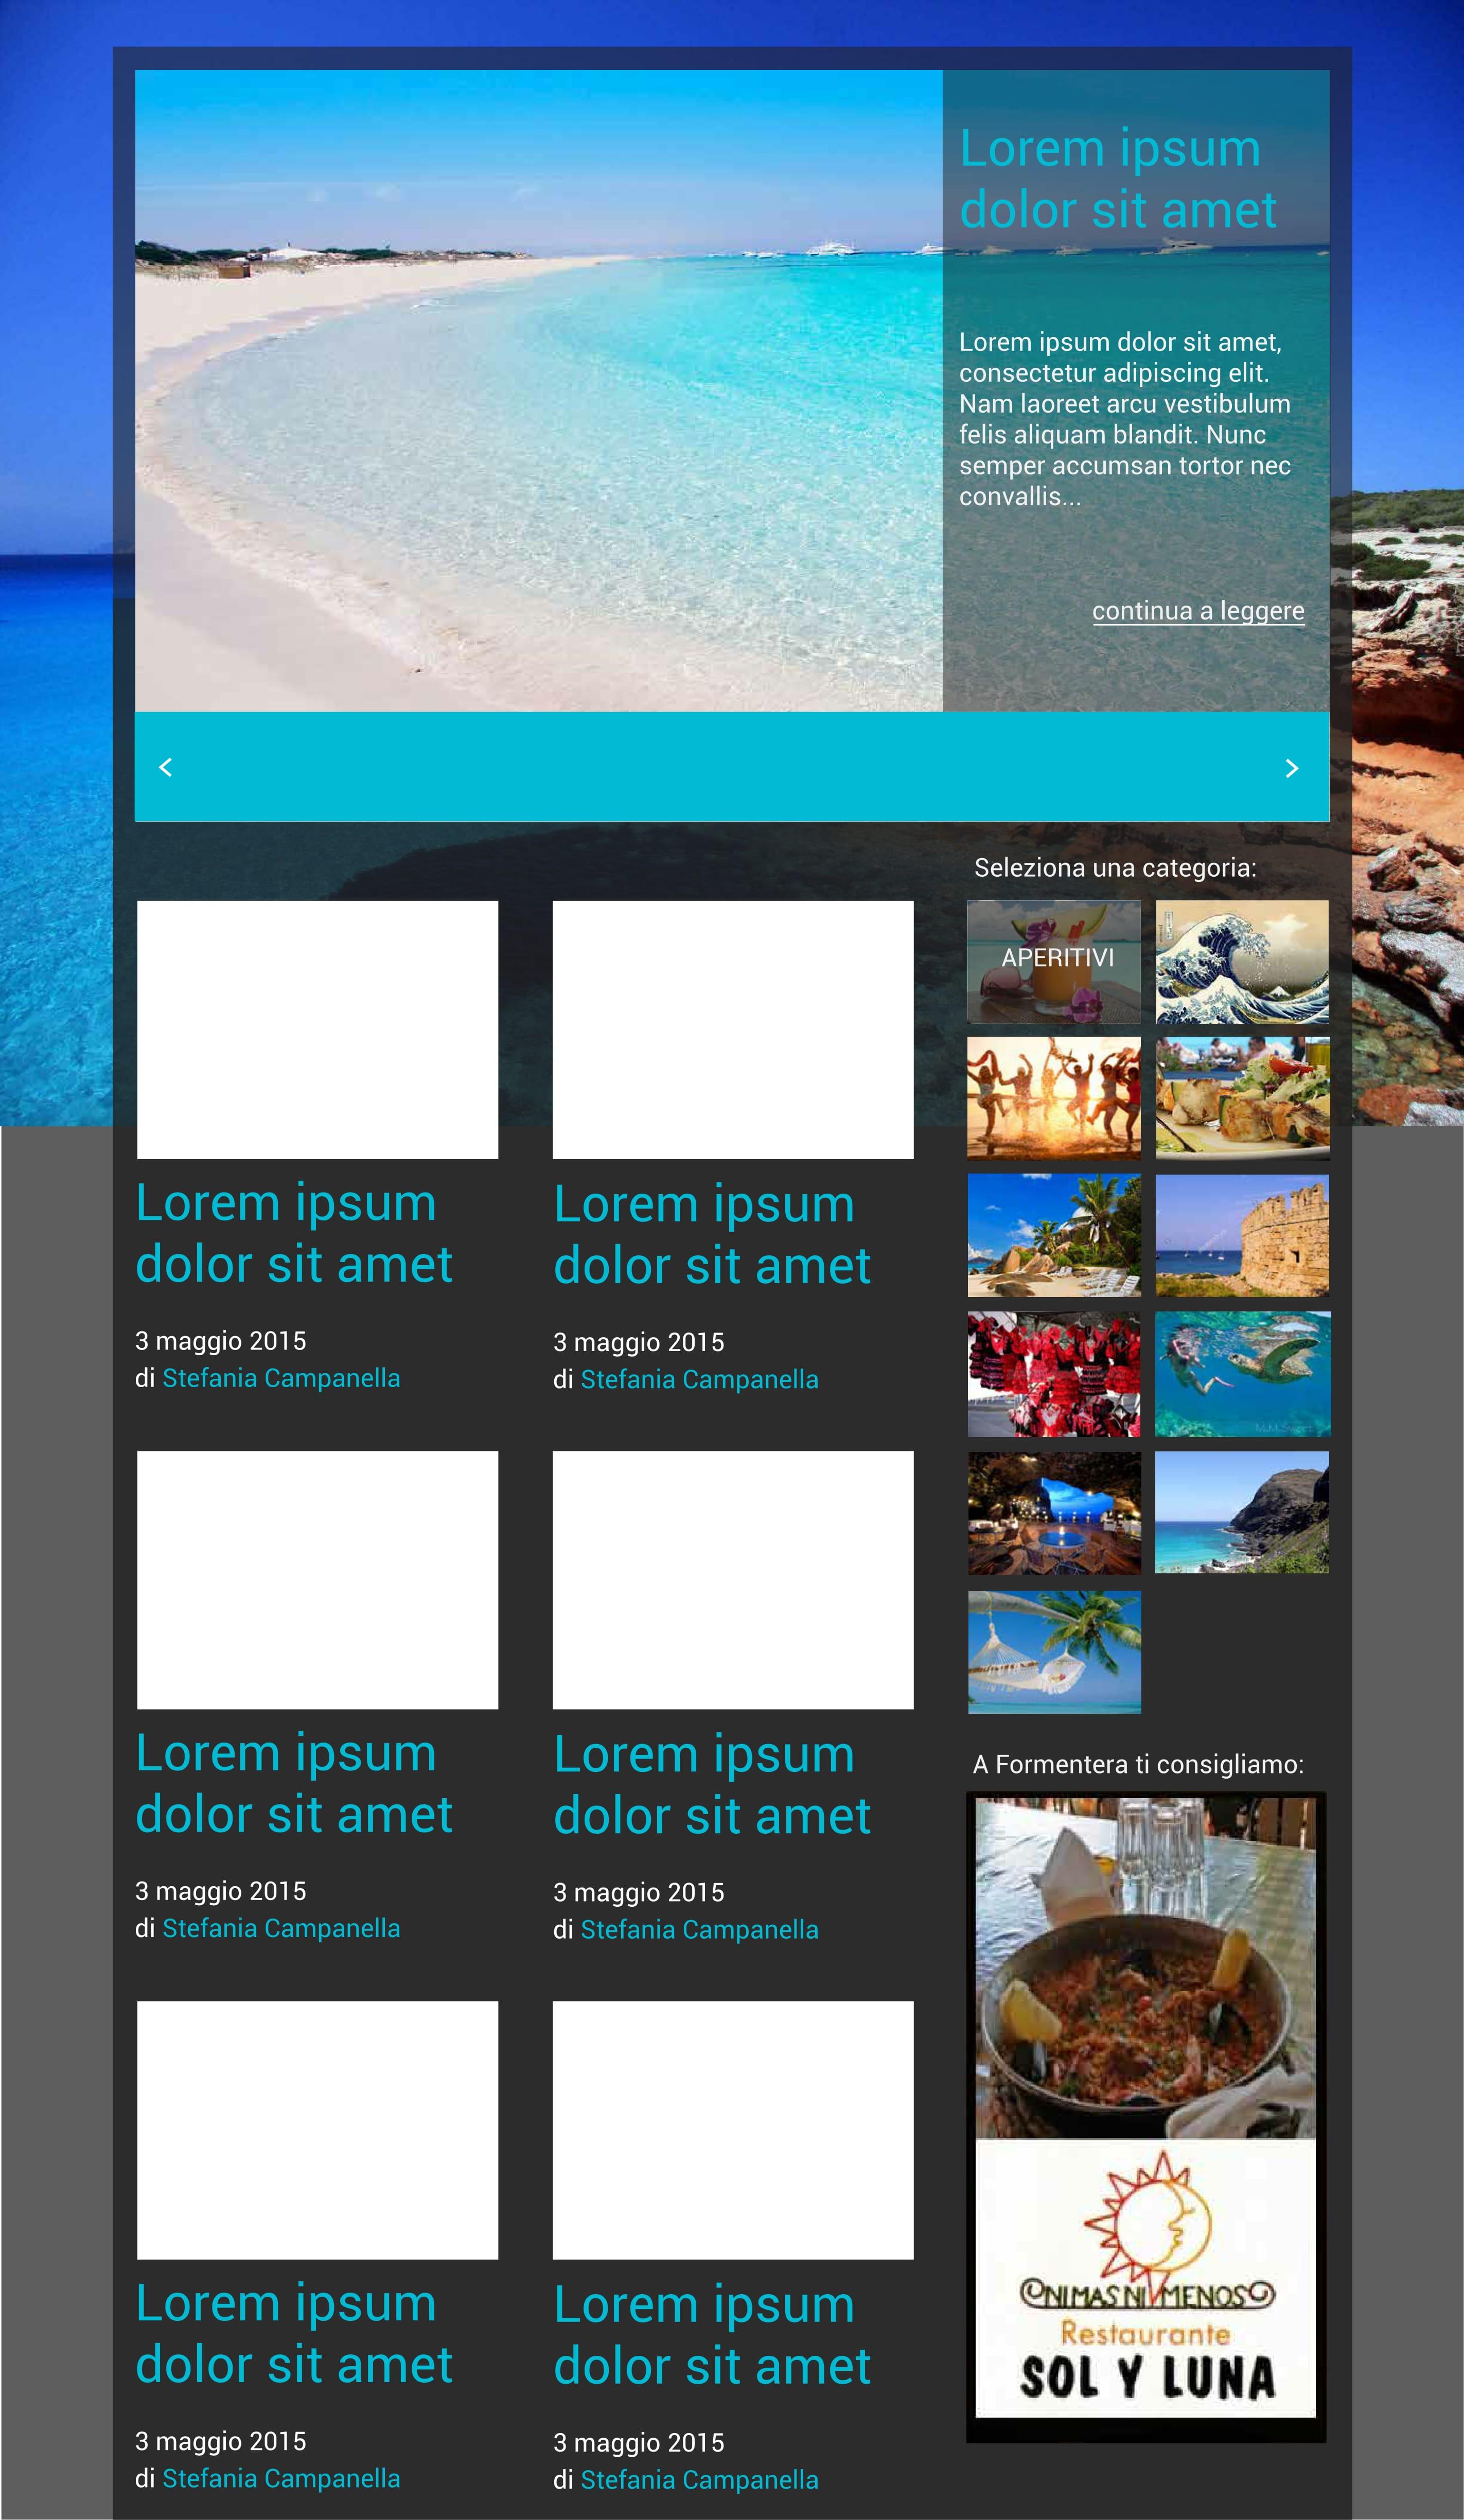 Formentera blog list articles 1